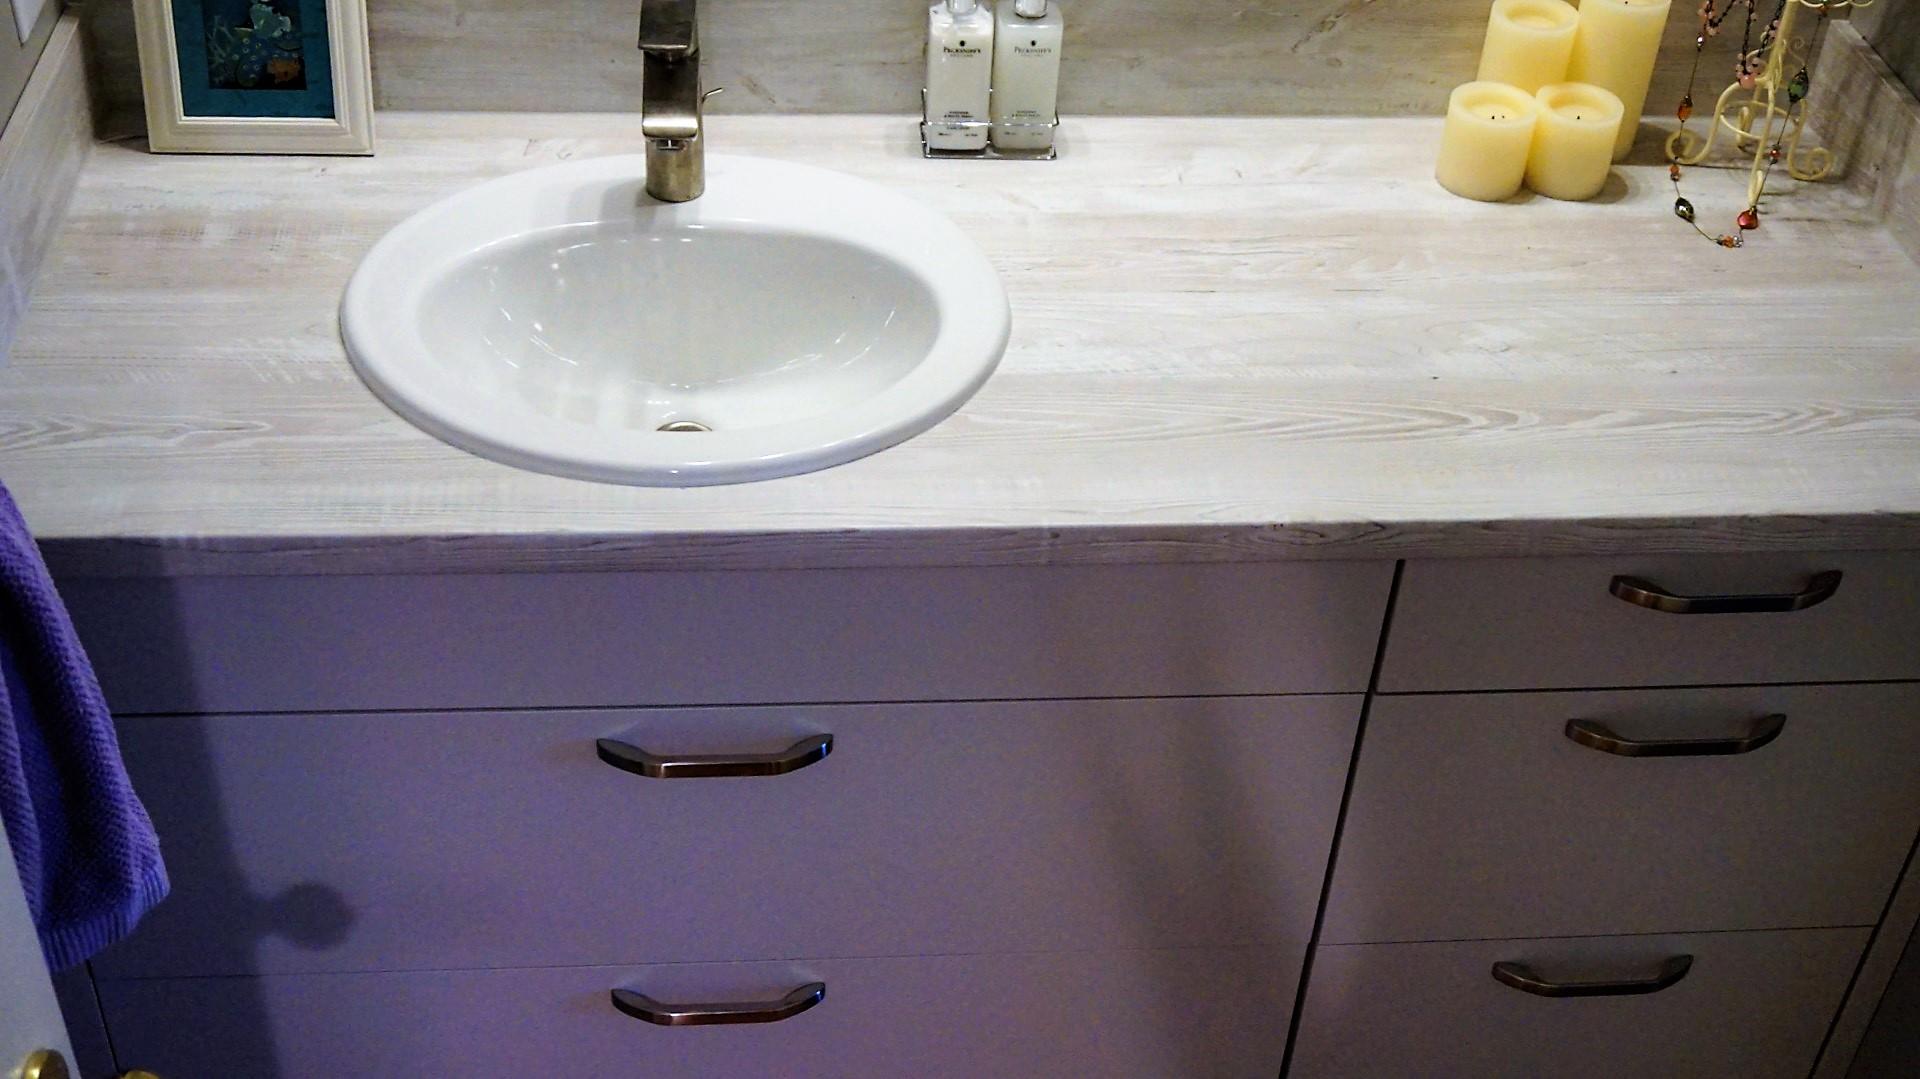 Guest bath room, Katy TX